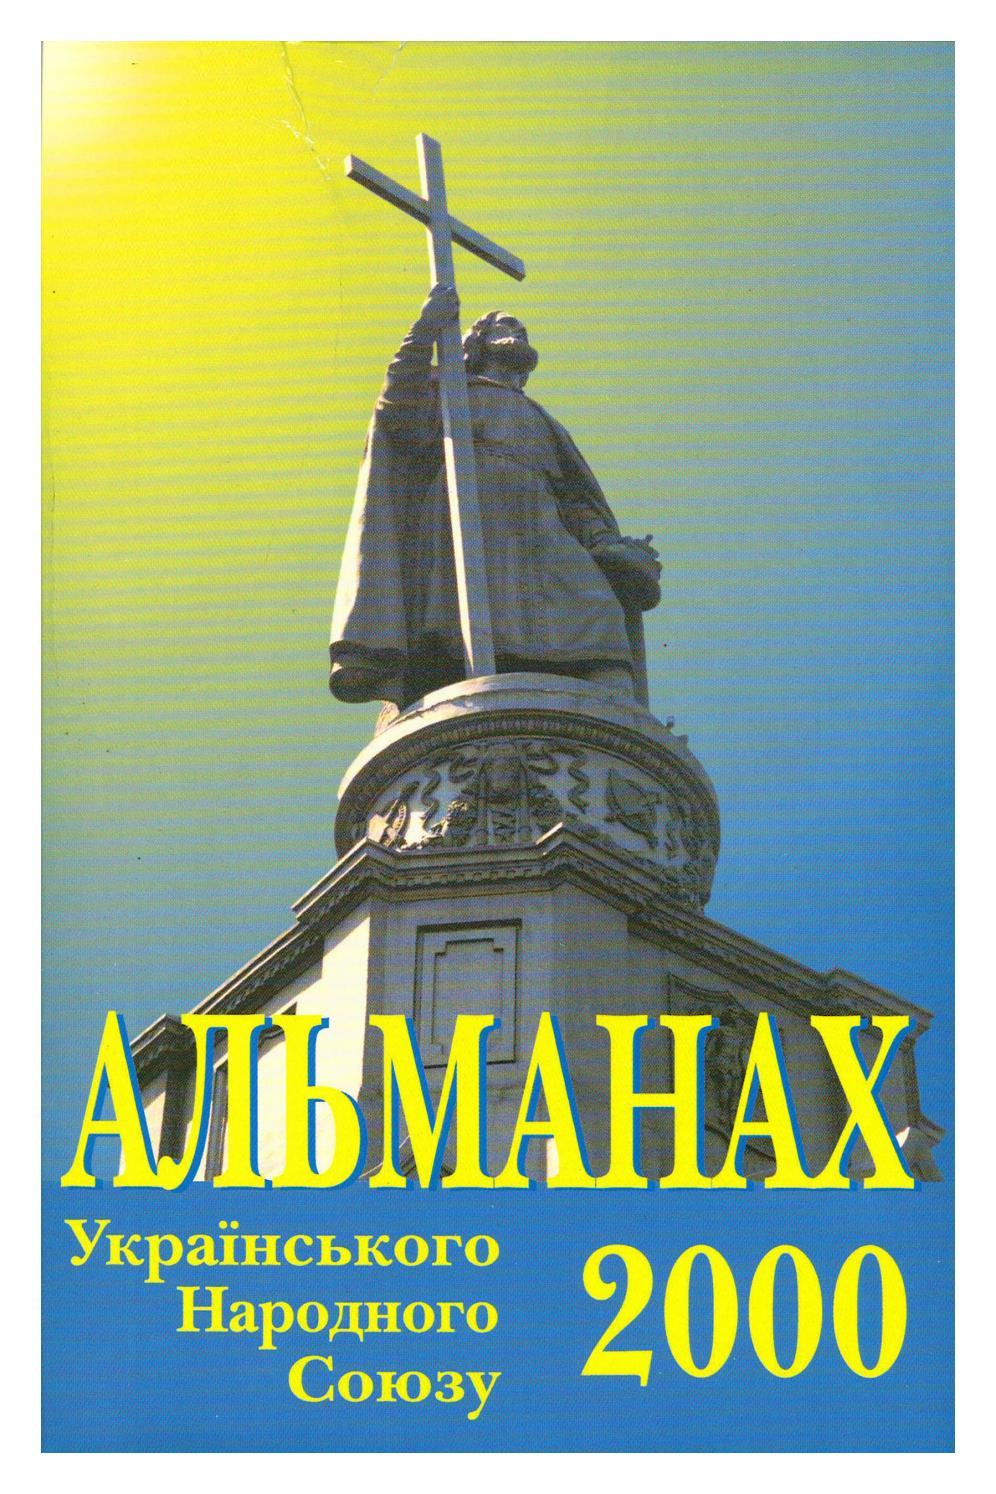 Альманах Українського Народного Союзу на рік 2000 by Січеславська Просвіта  - issuu 1709af8dea715